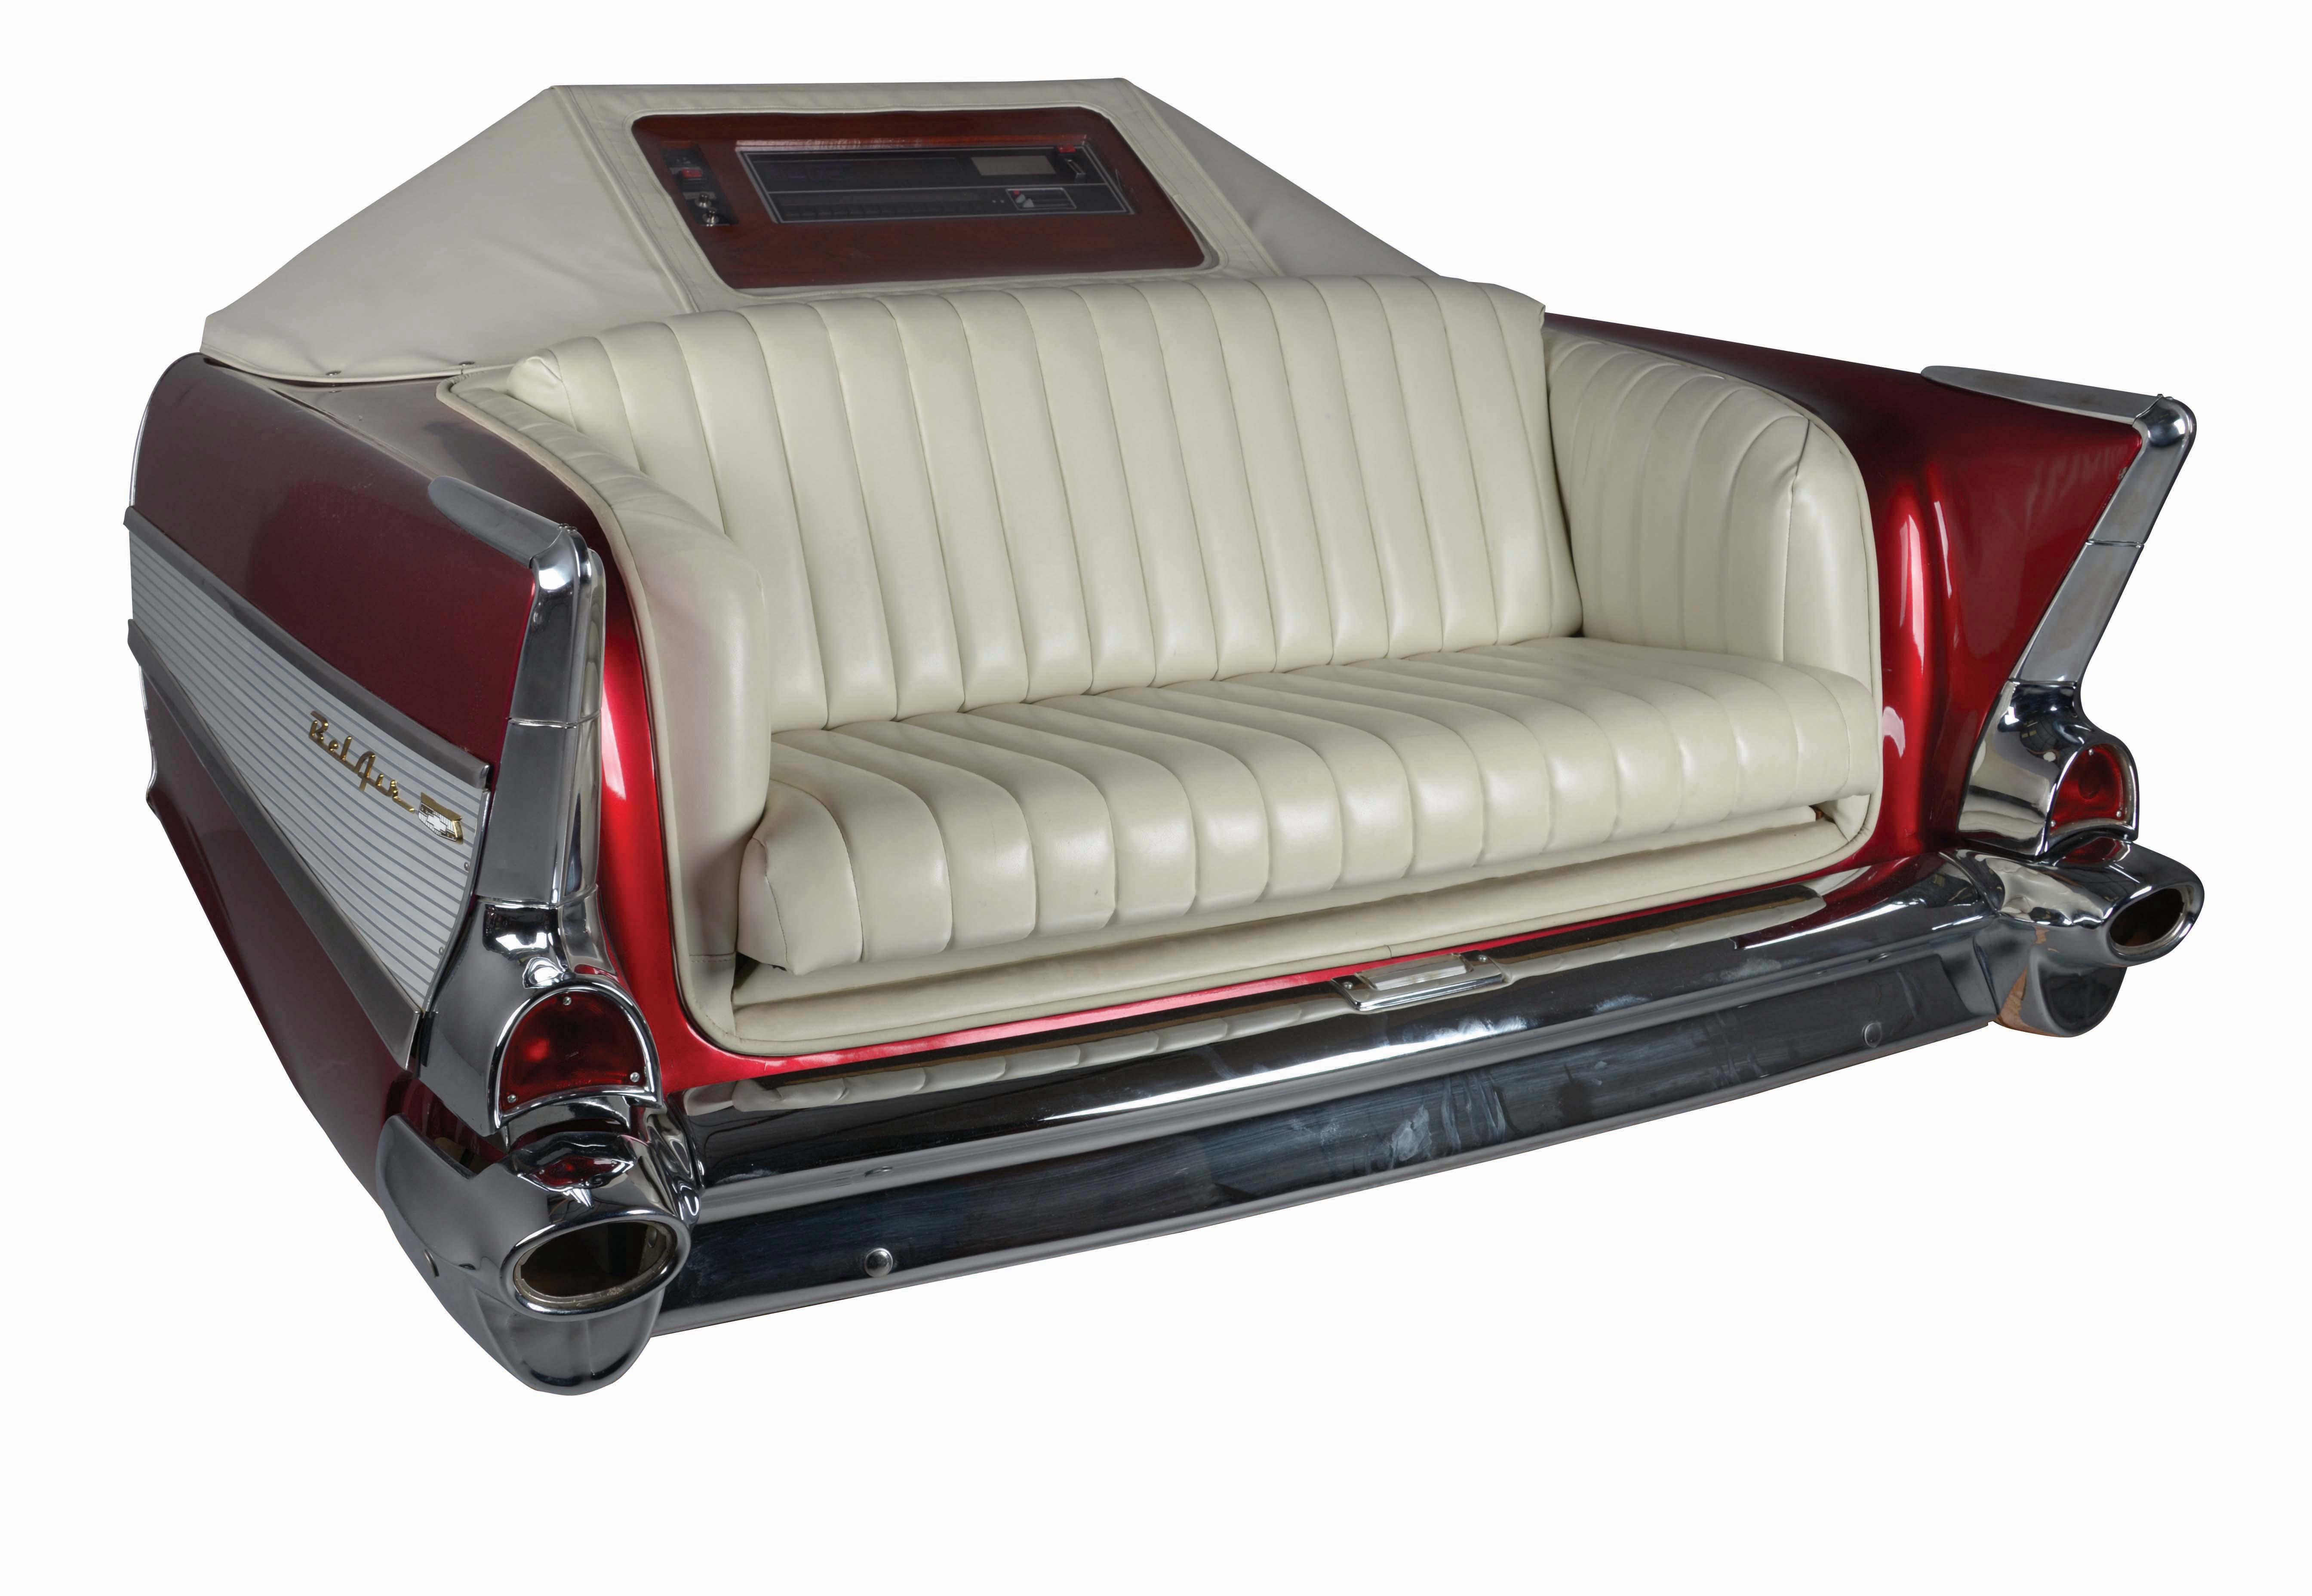 Rare Jukebox '57 Chevy «The Ultimate Jukebox»